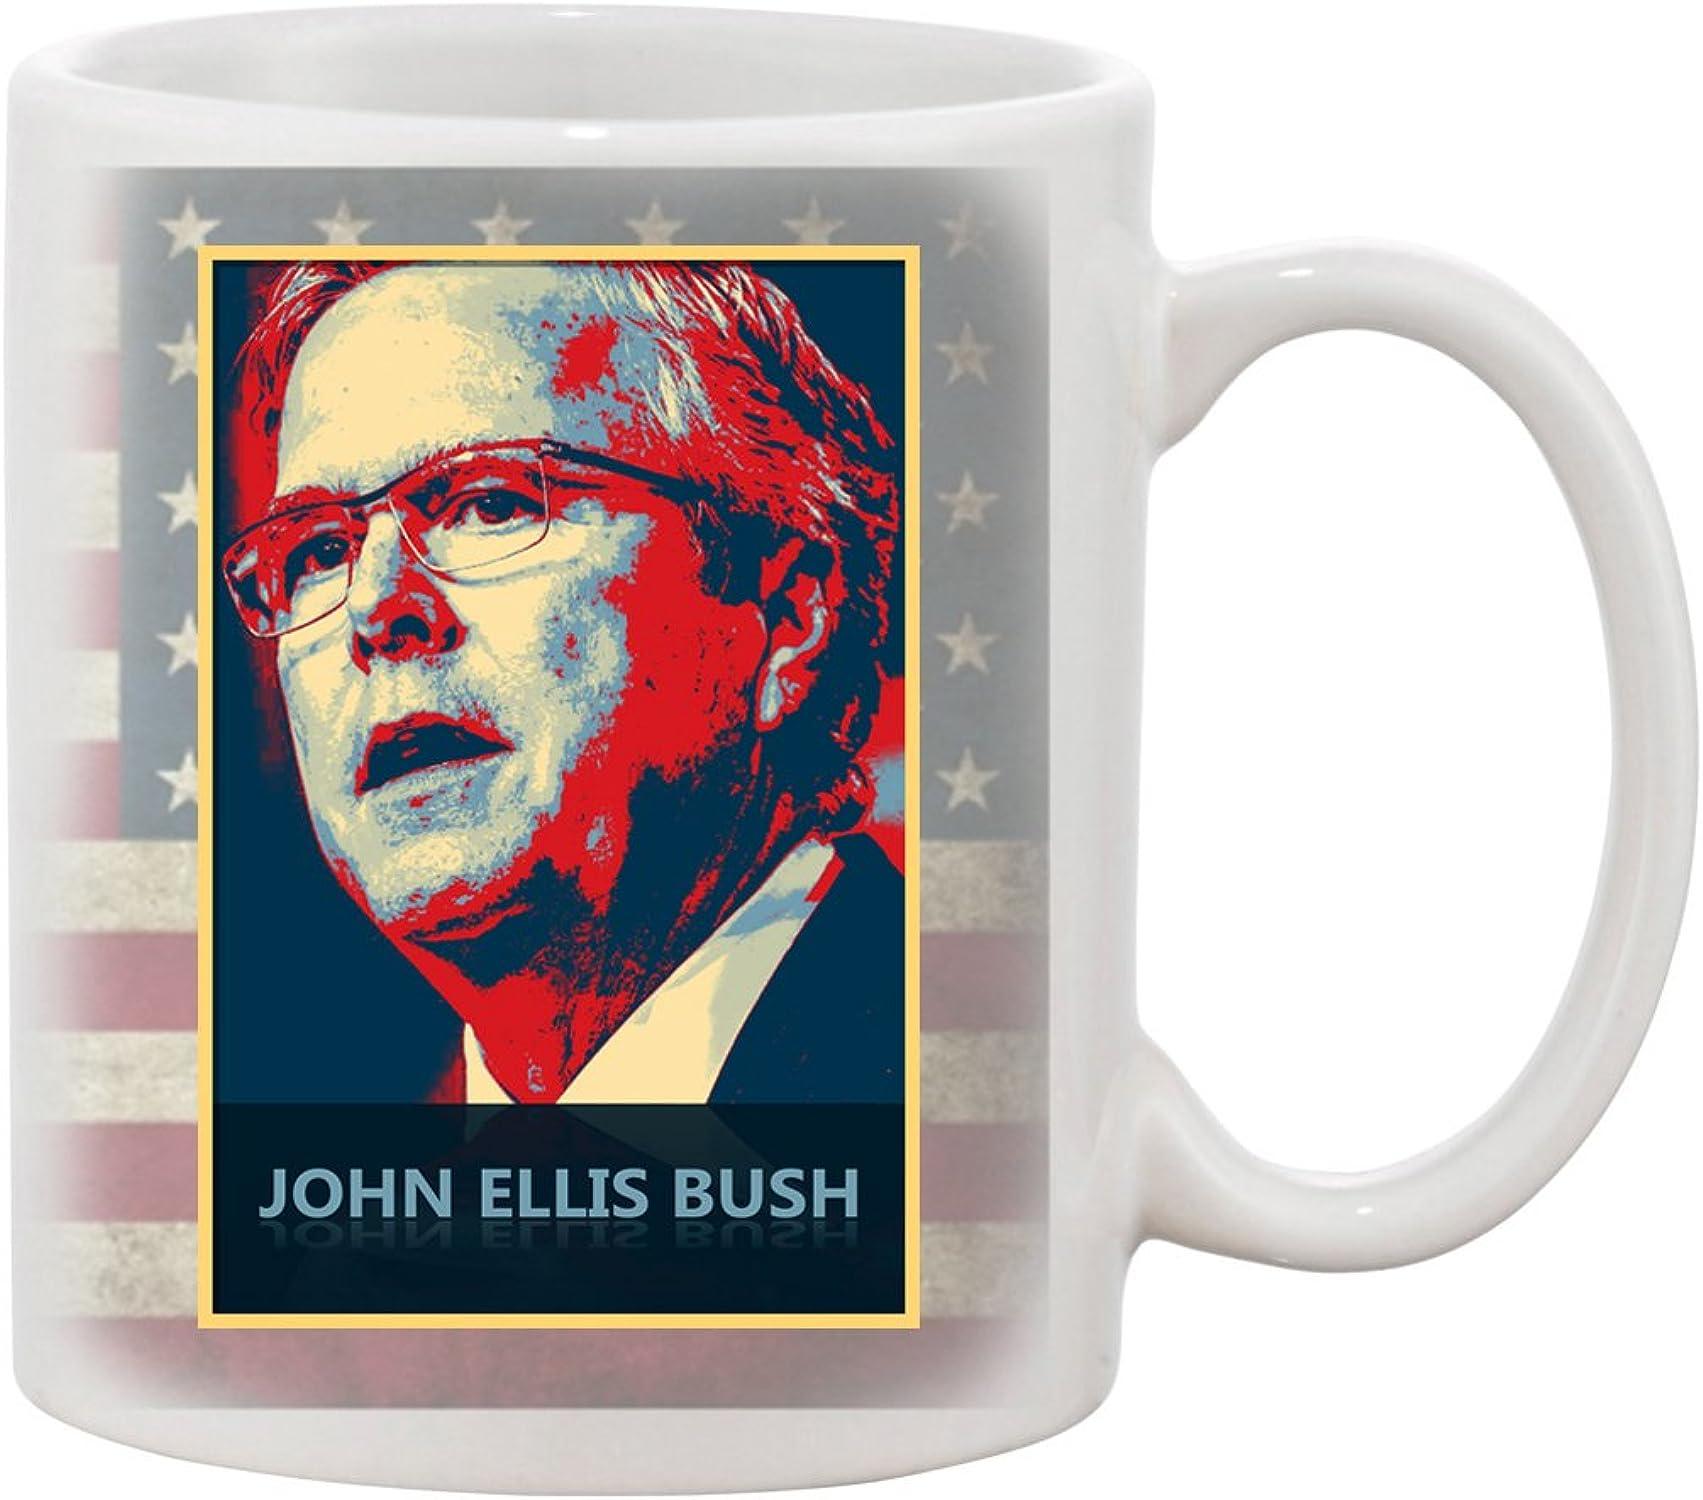 Ceramic Coffee Mug - JEB - Presidential Candidate Design by B&A